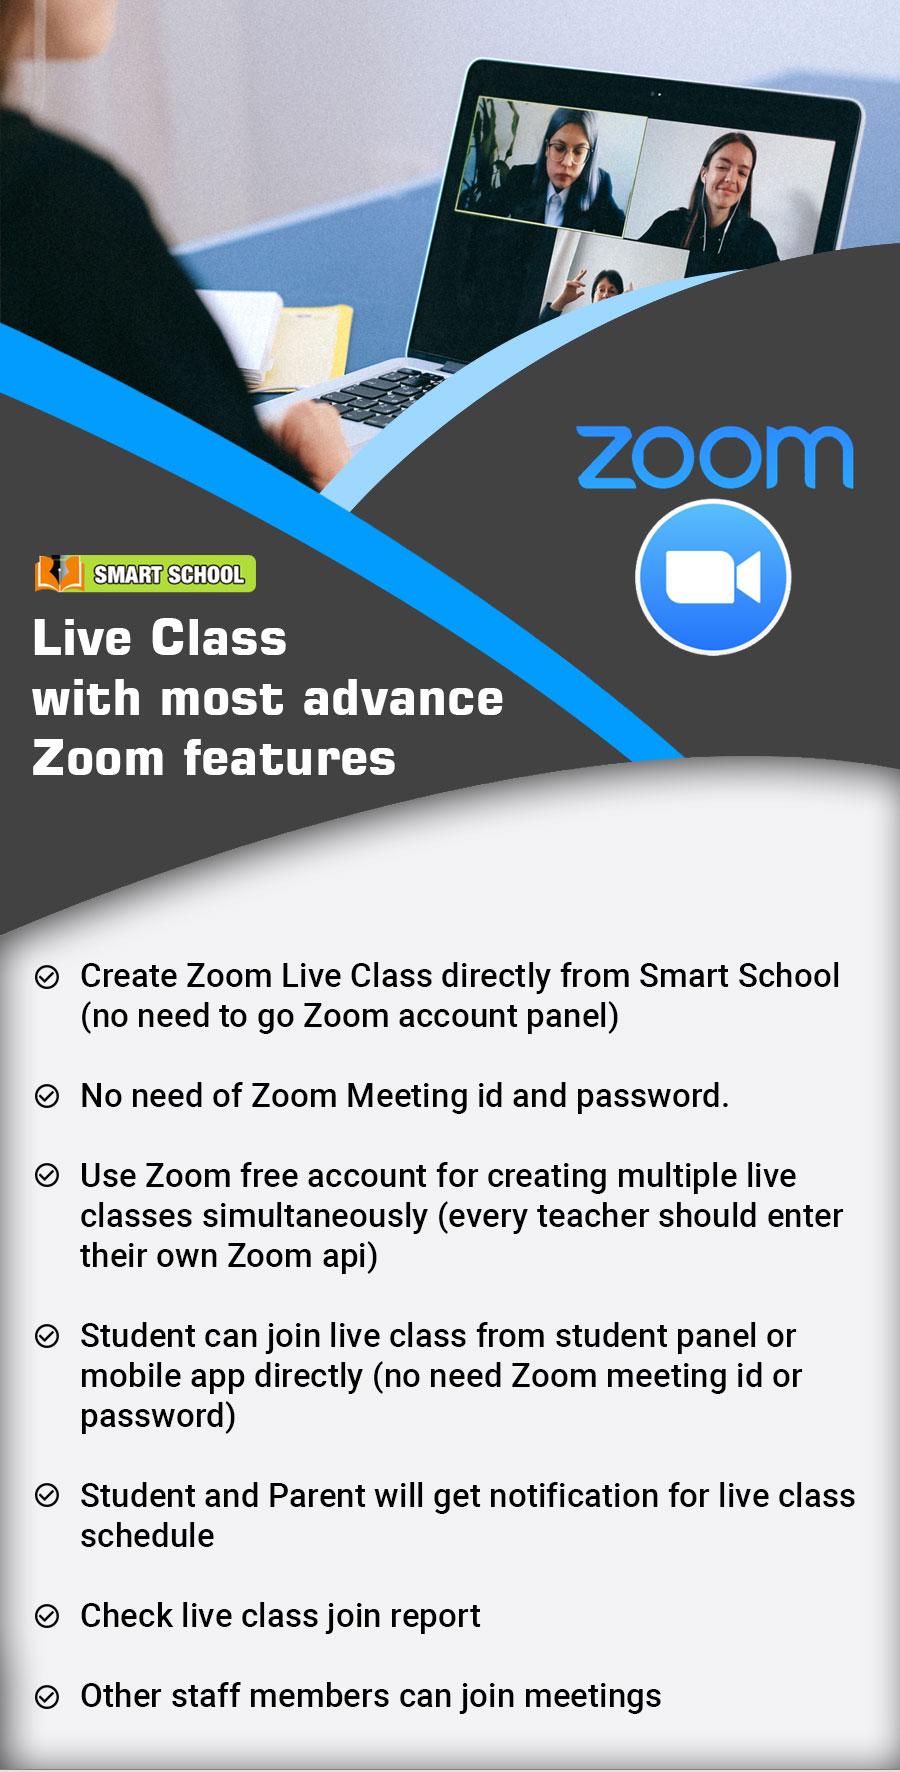 Características de Smart School Zoom Live Class